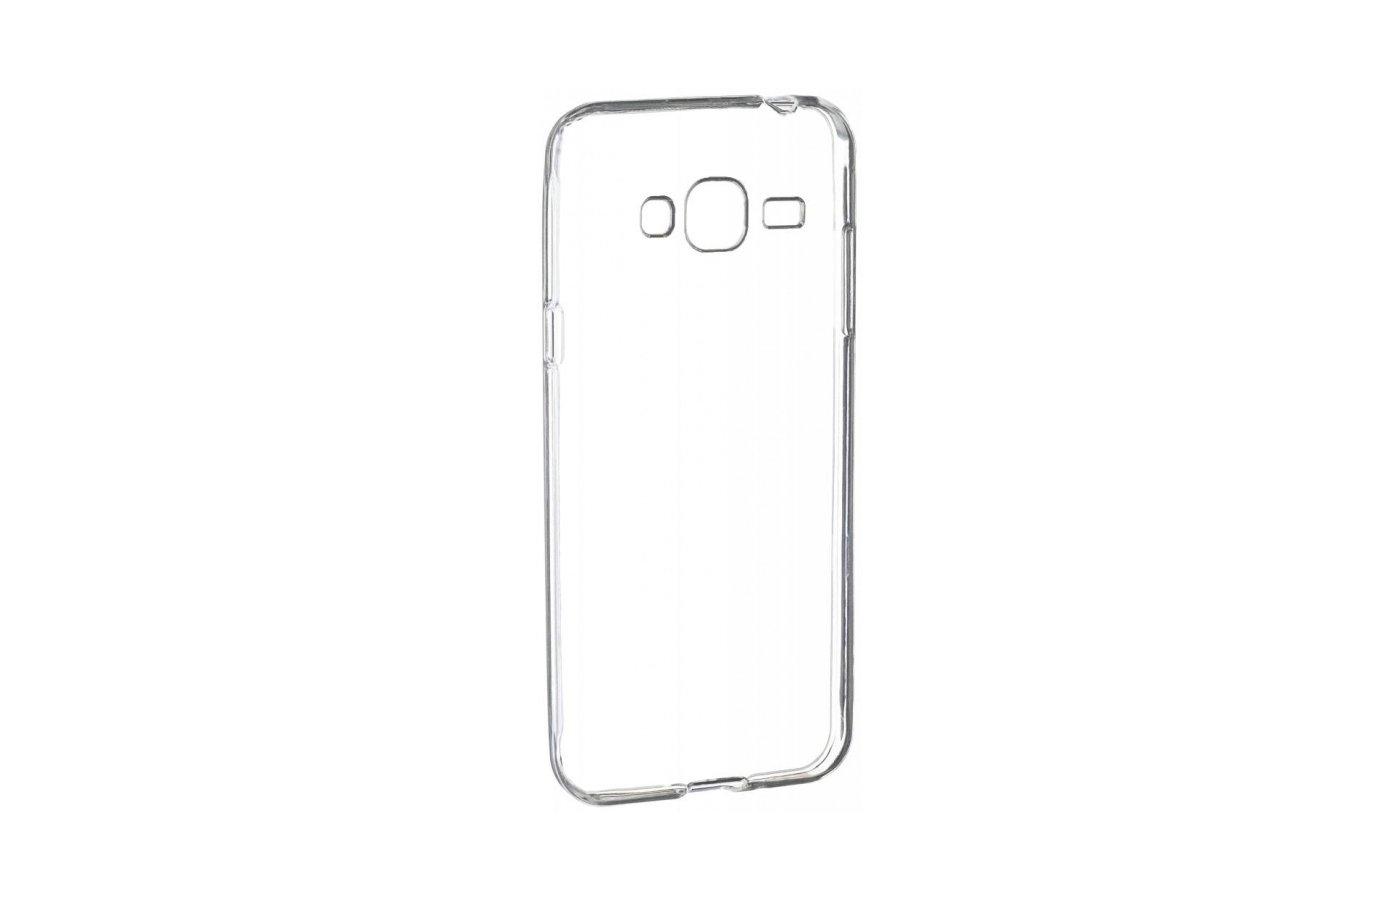 Чехол iBox Crystal для Sony Xperia XA Ultra (F3212) прозрачный